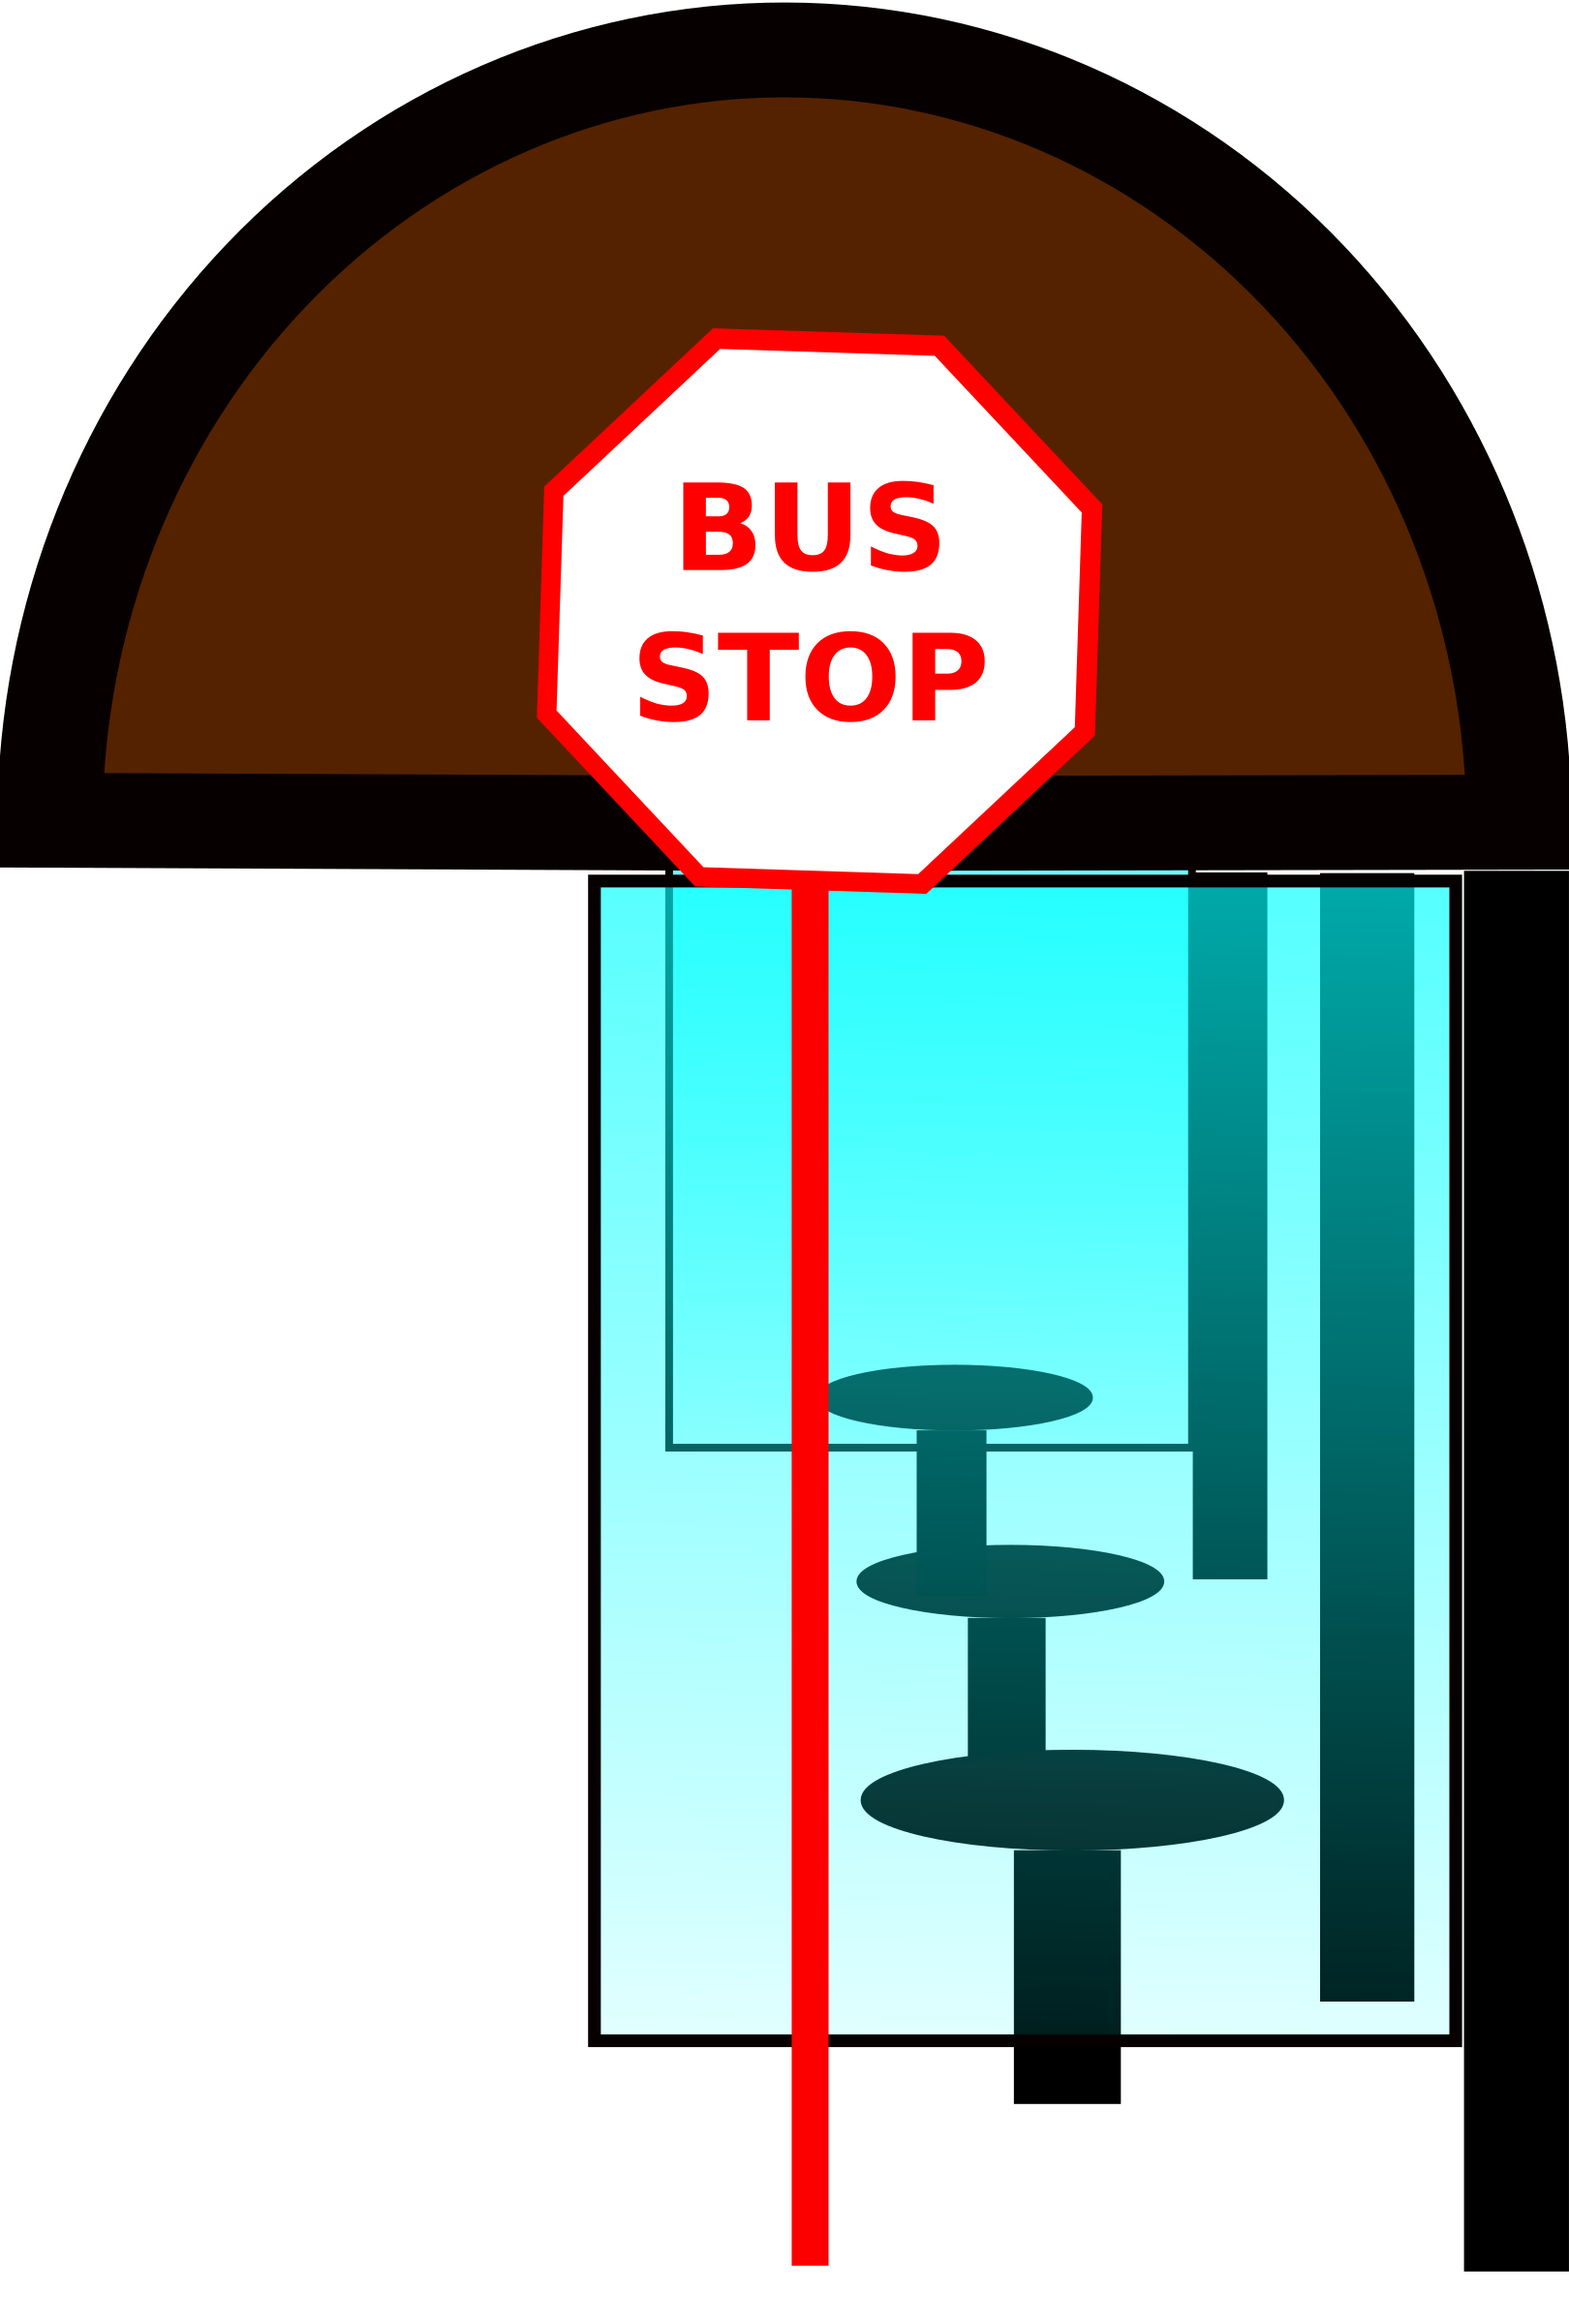 Halt big image png. Free clipart bus